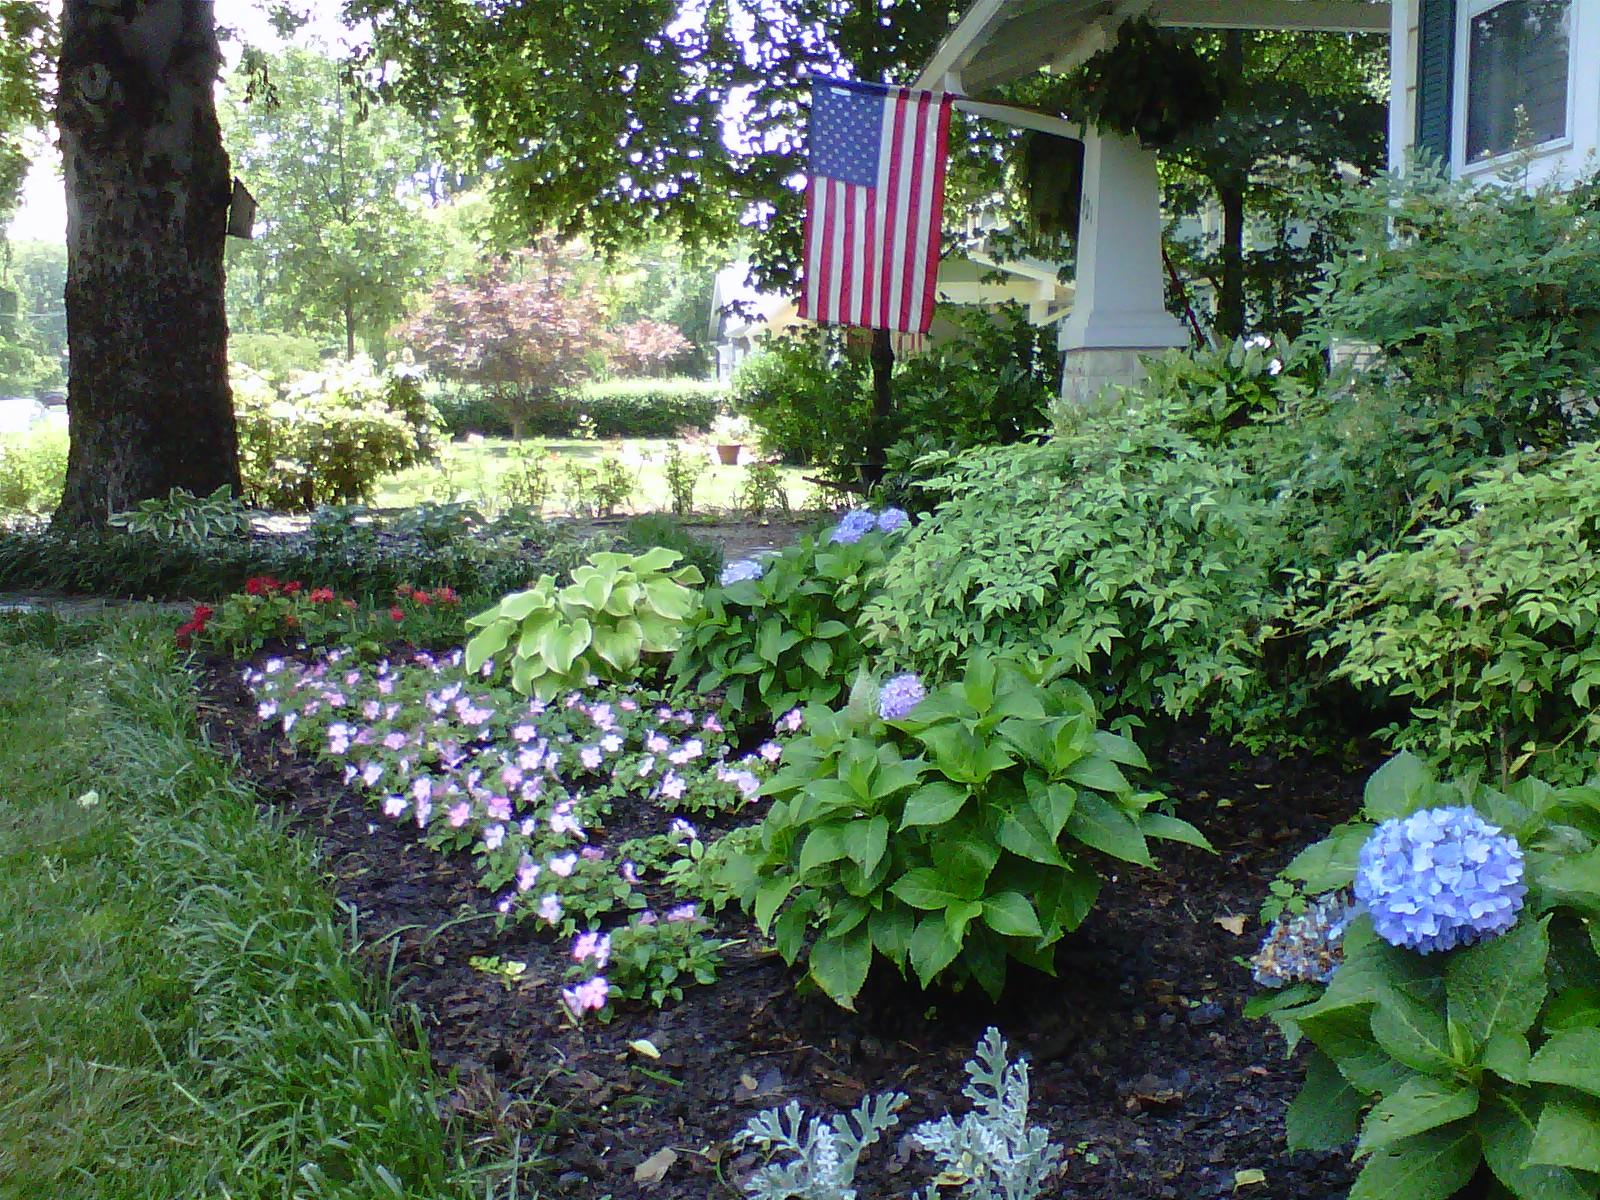 Justin Stelter Landscape Gardening - Cottage Garden - 12465666904_2a0a783e0f_o.jpg